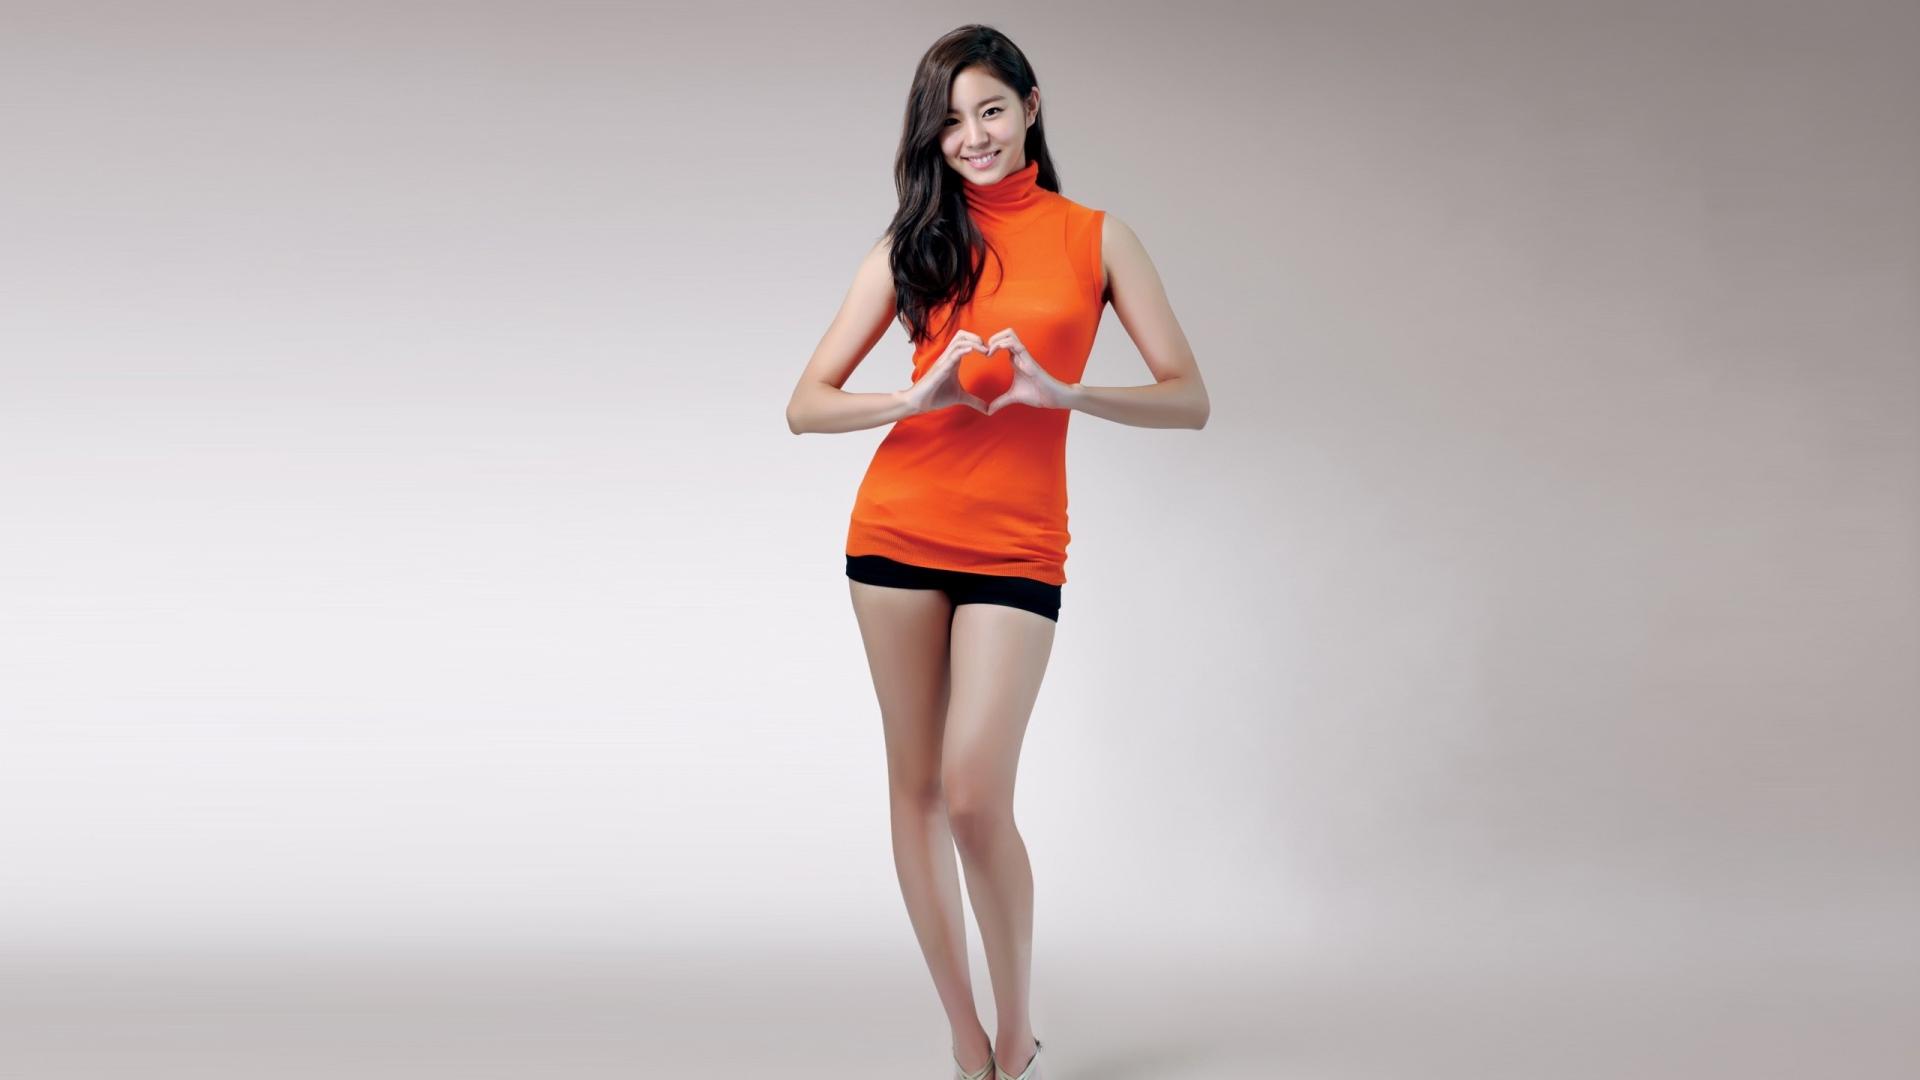 Download Wallpaper 1920x1080 korea, girl, style, model